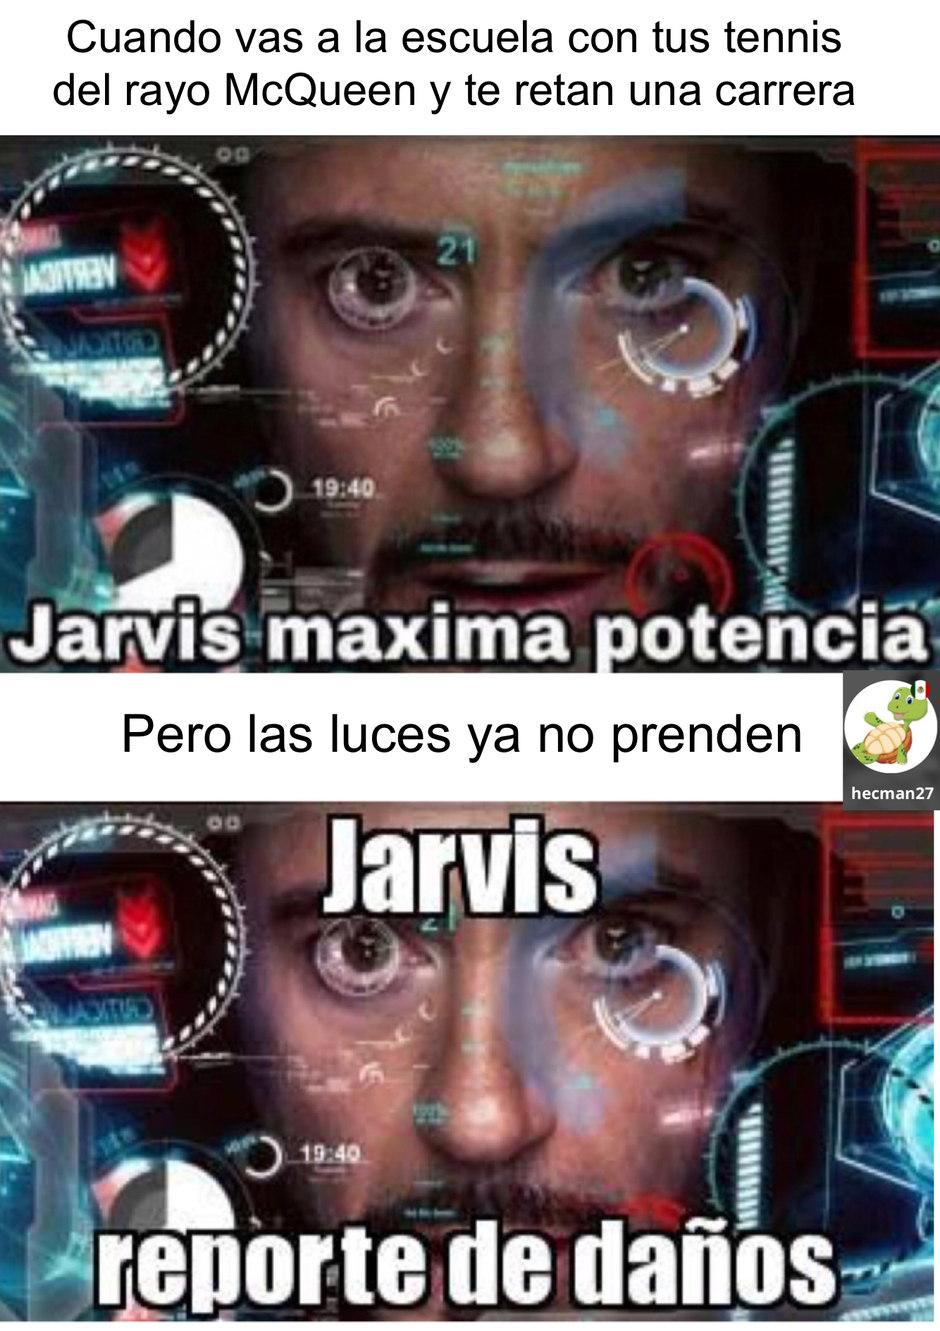 Rayo - meme